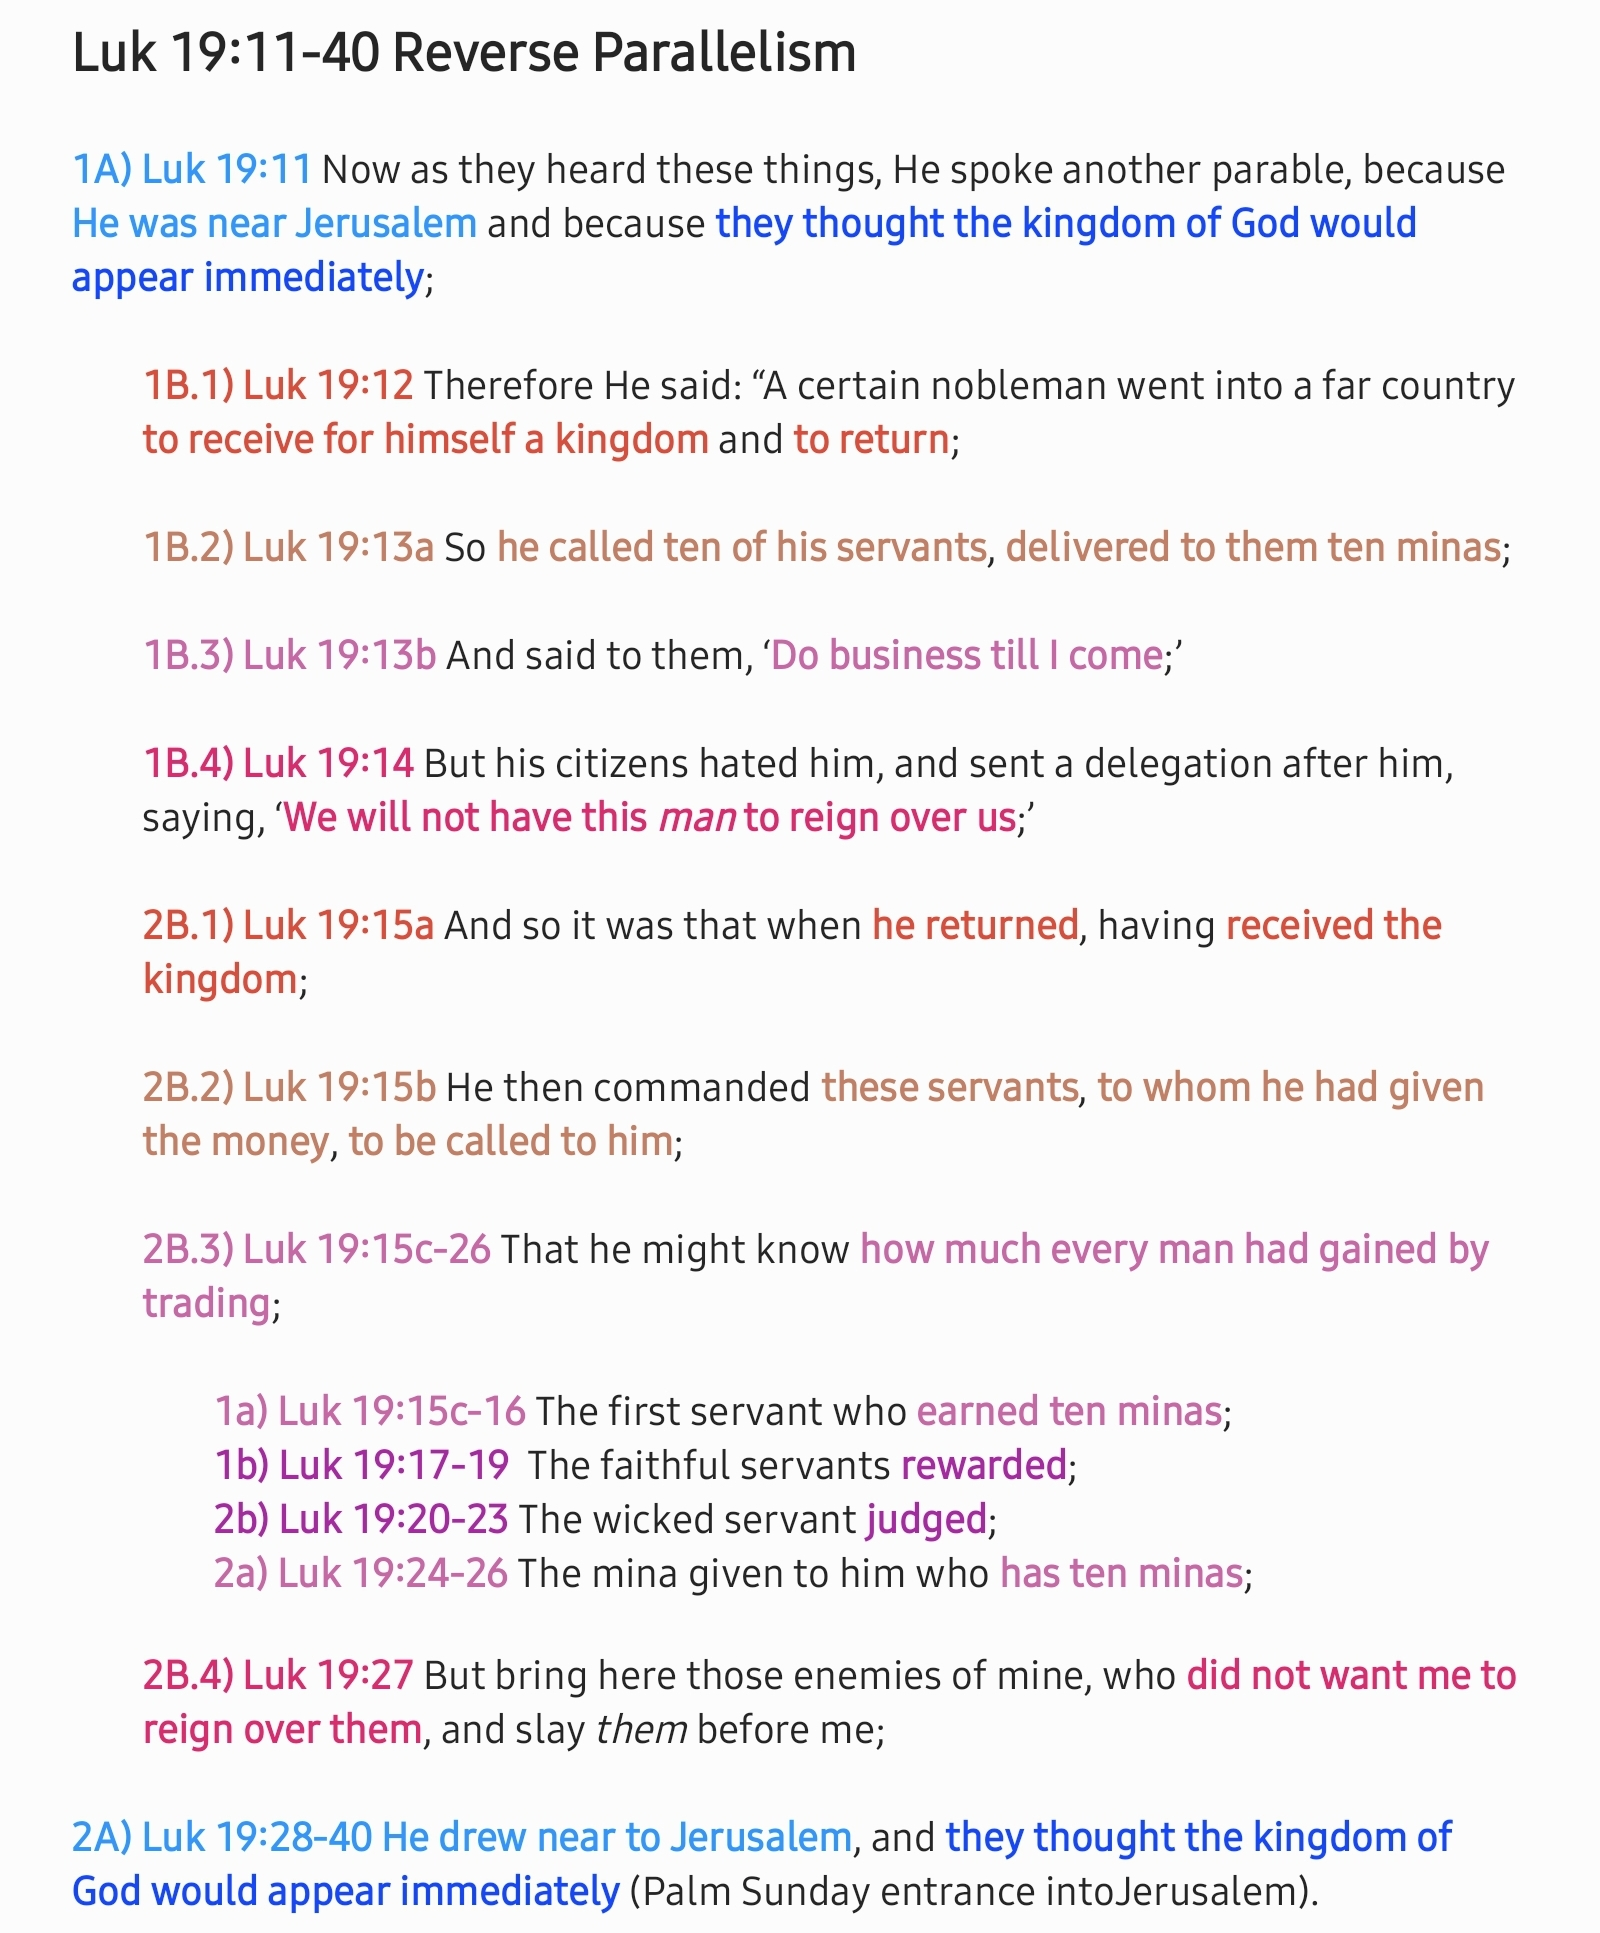 Luk 19:11-40 Reverse parallelism | hebraicfaithbible.com